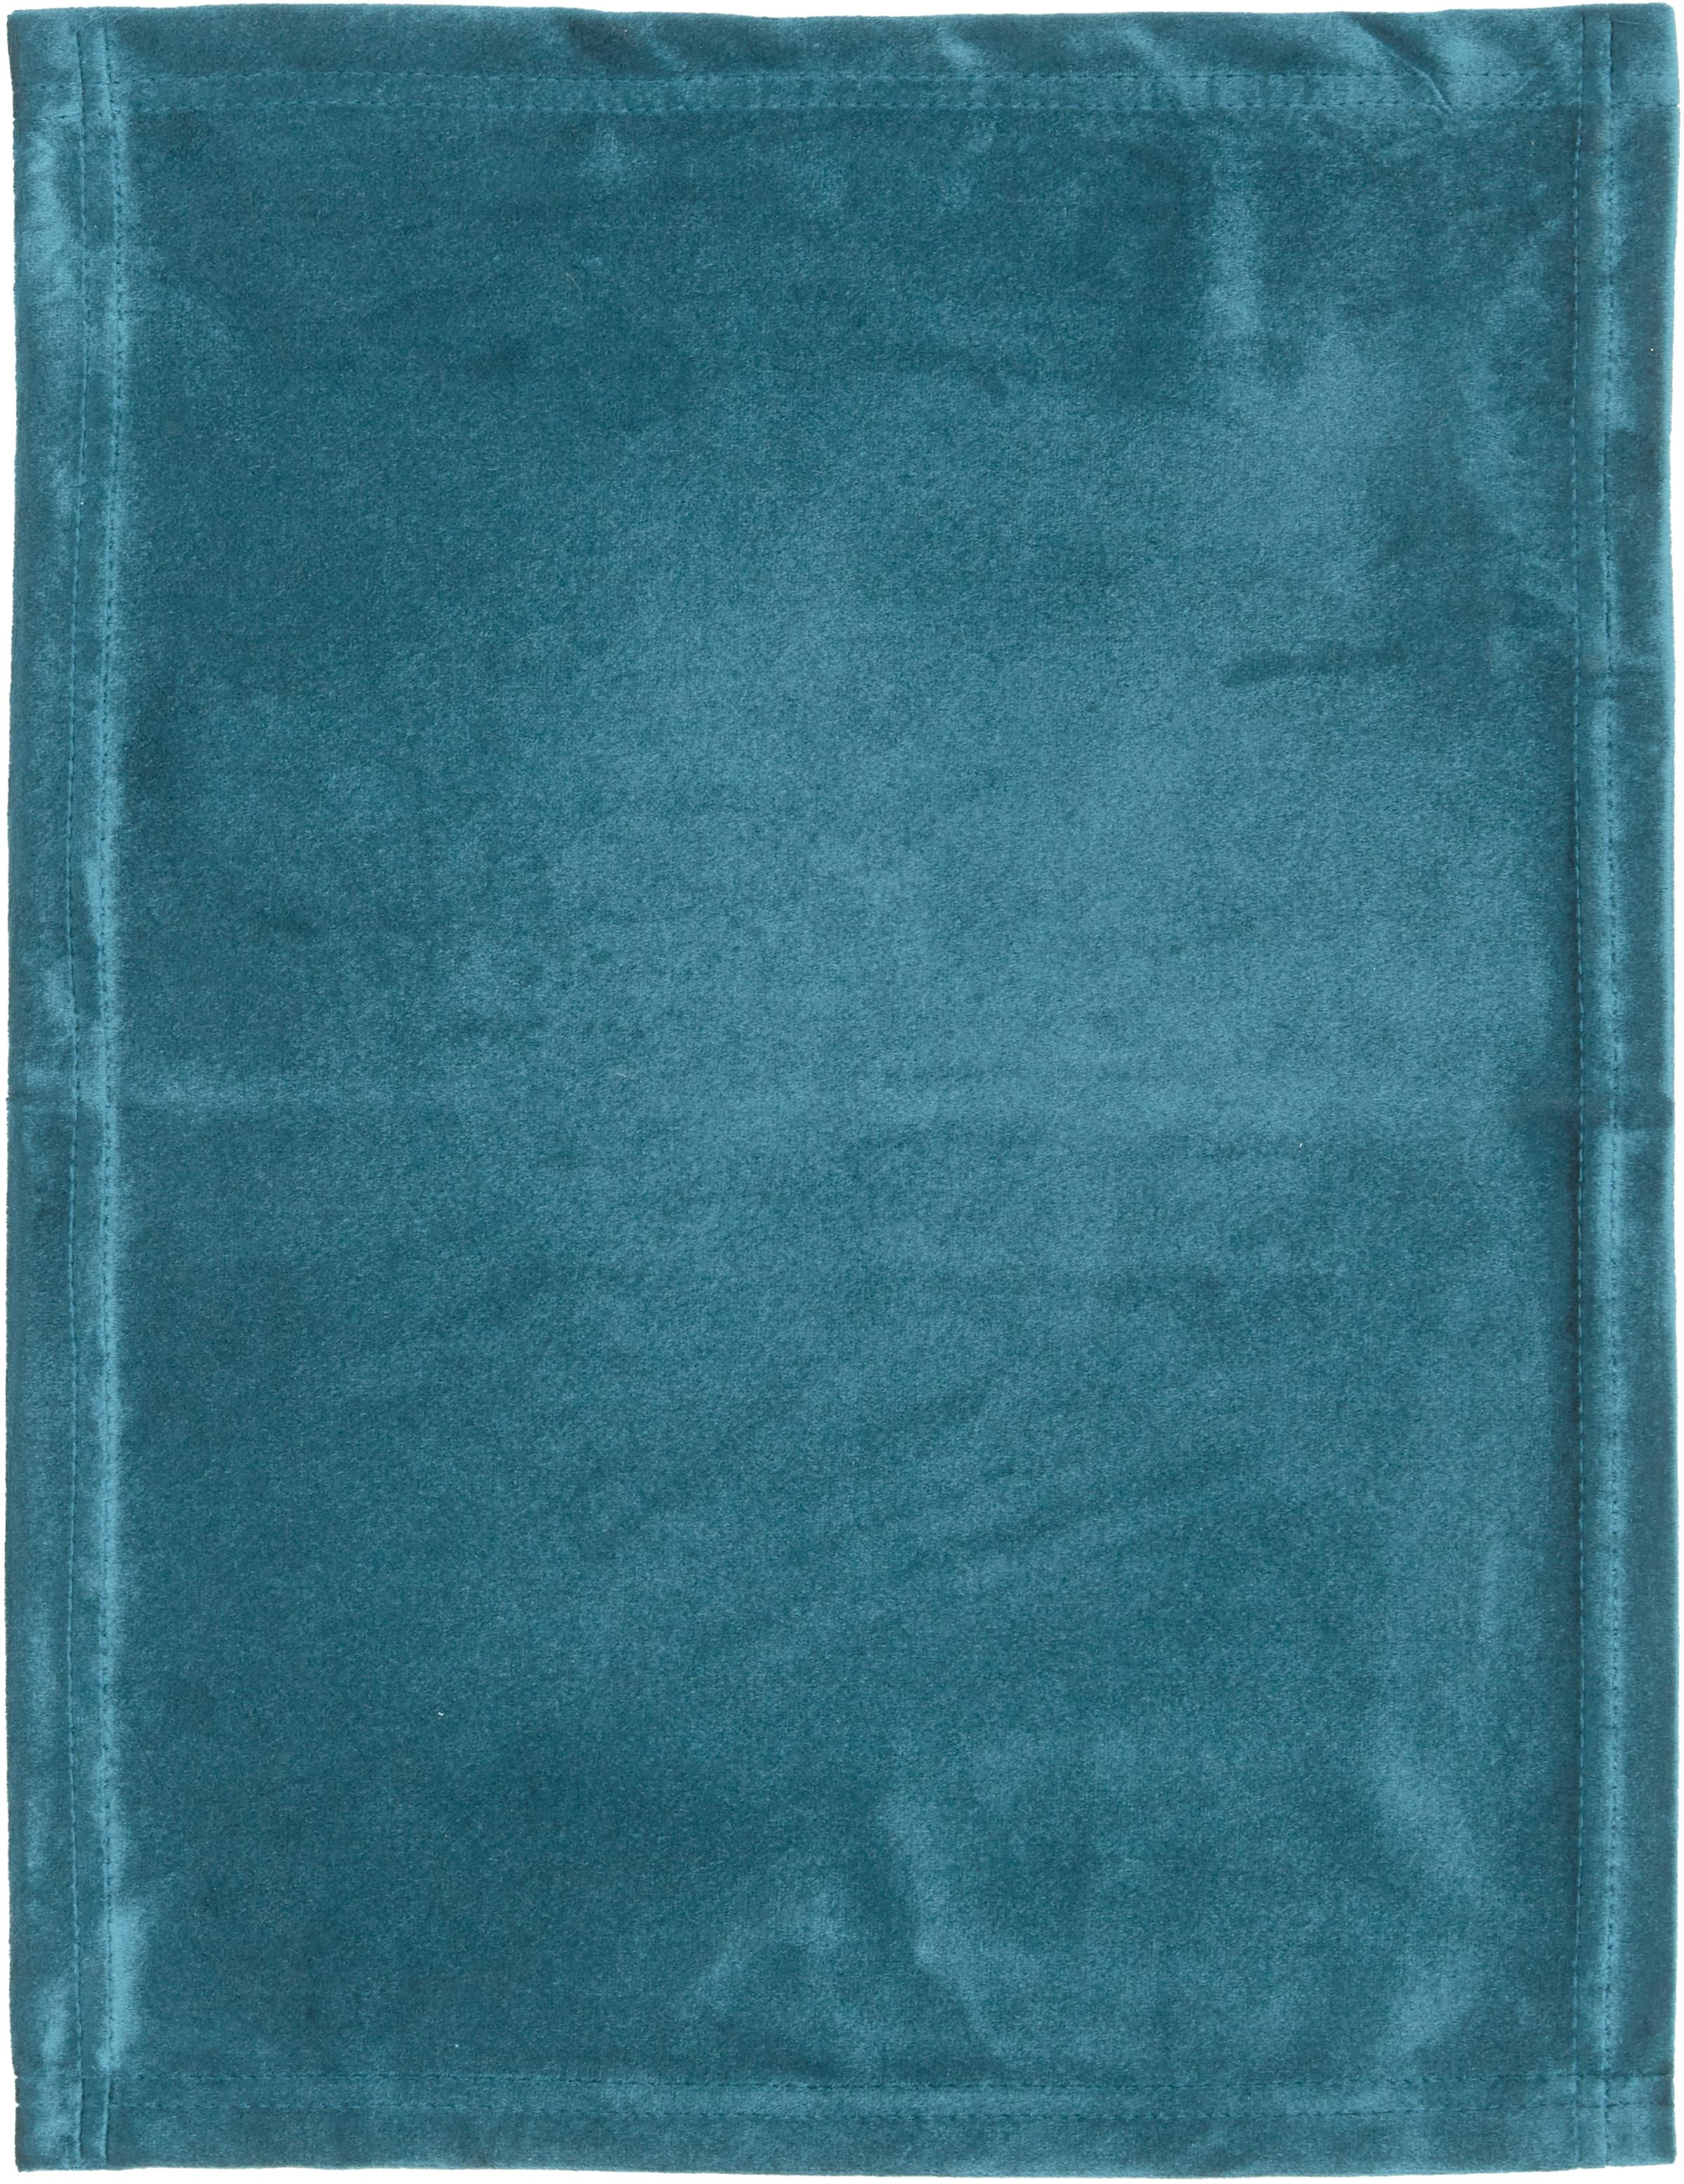 Samt-Tischsets Simone, 2 Stück, 100% Polyestersamt, Jadegrün, 35 x 45 cm